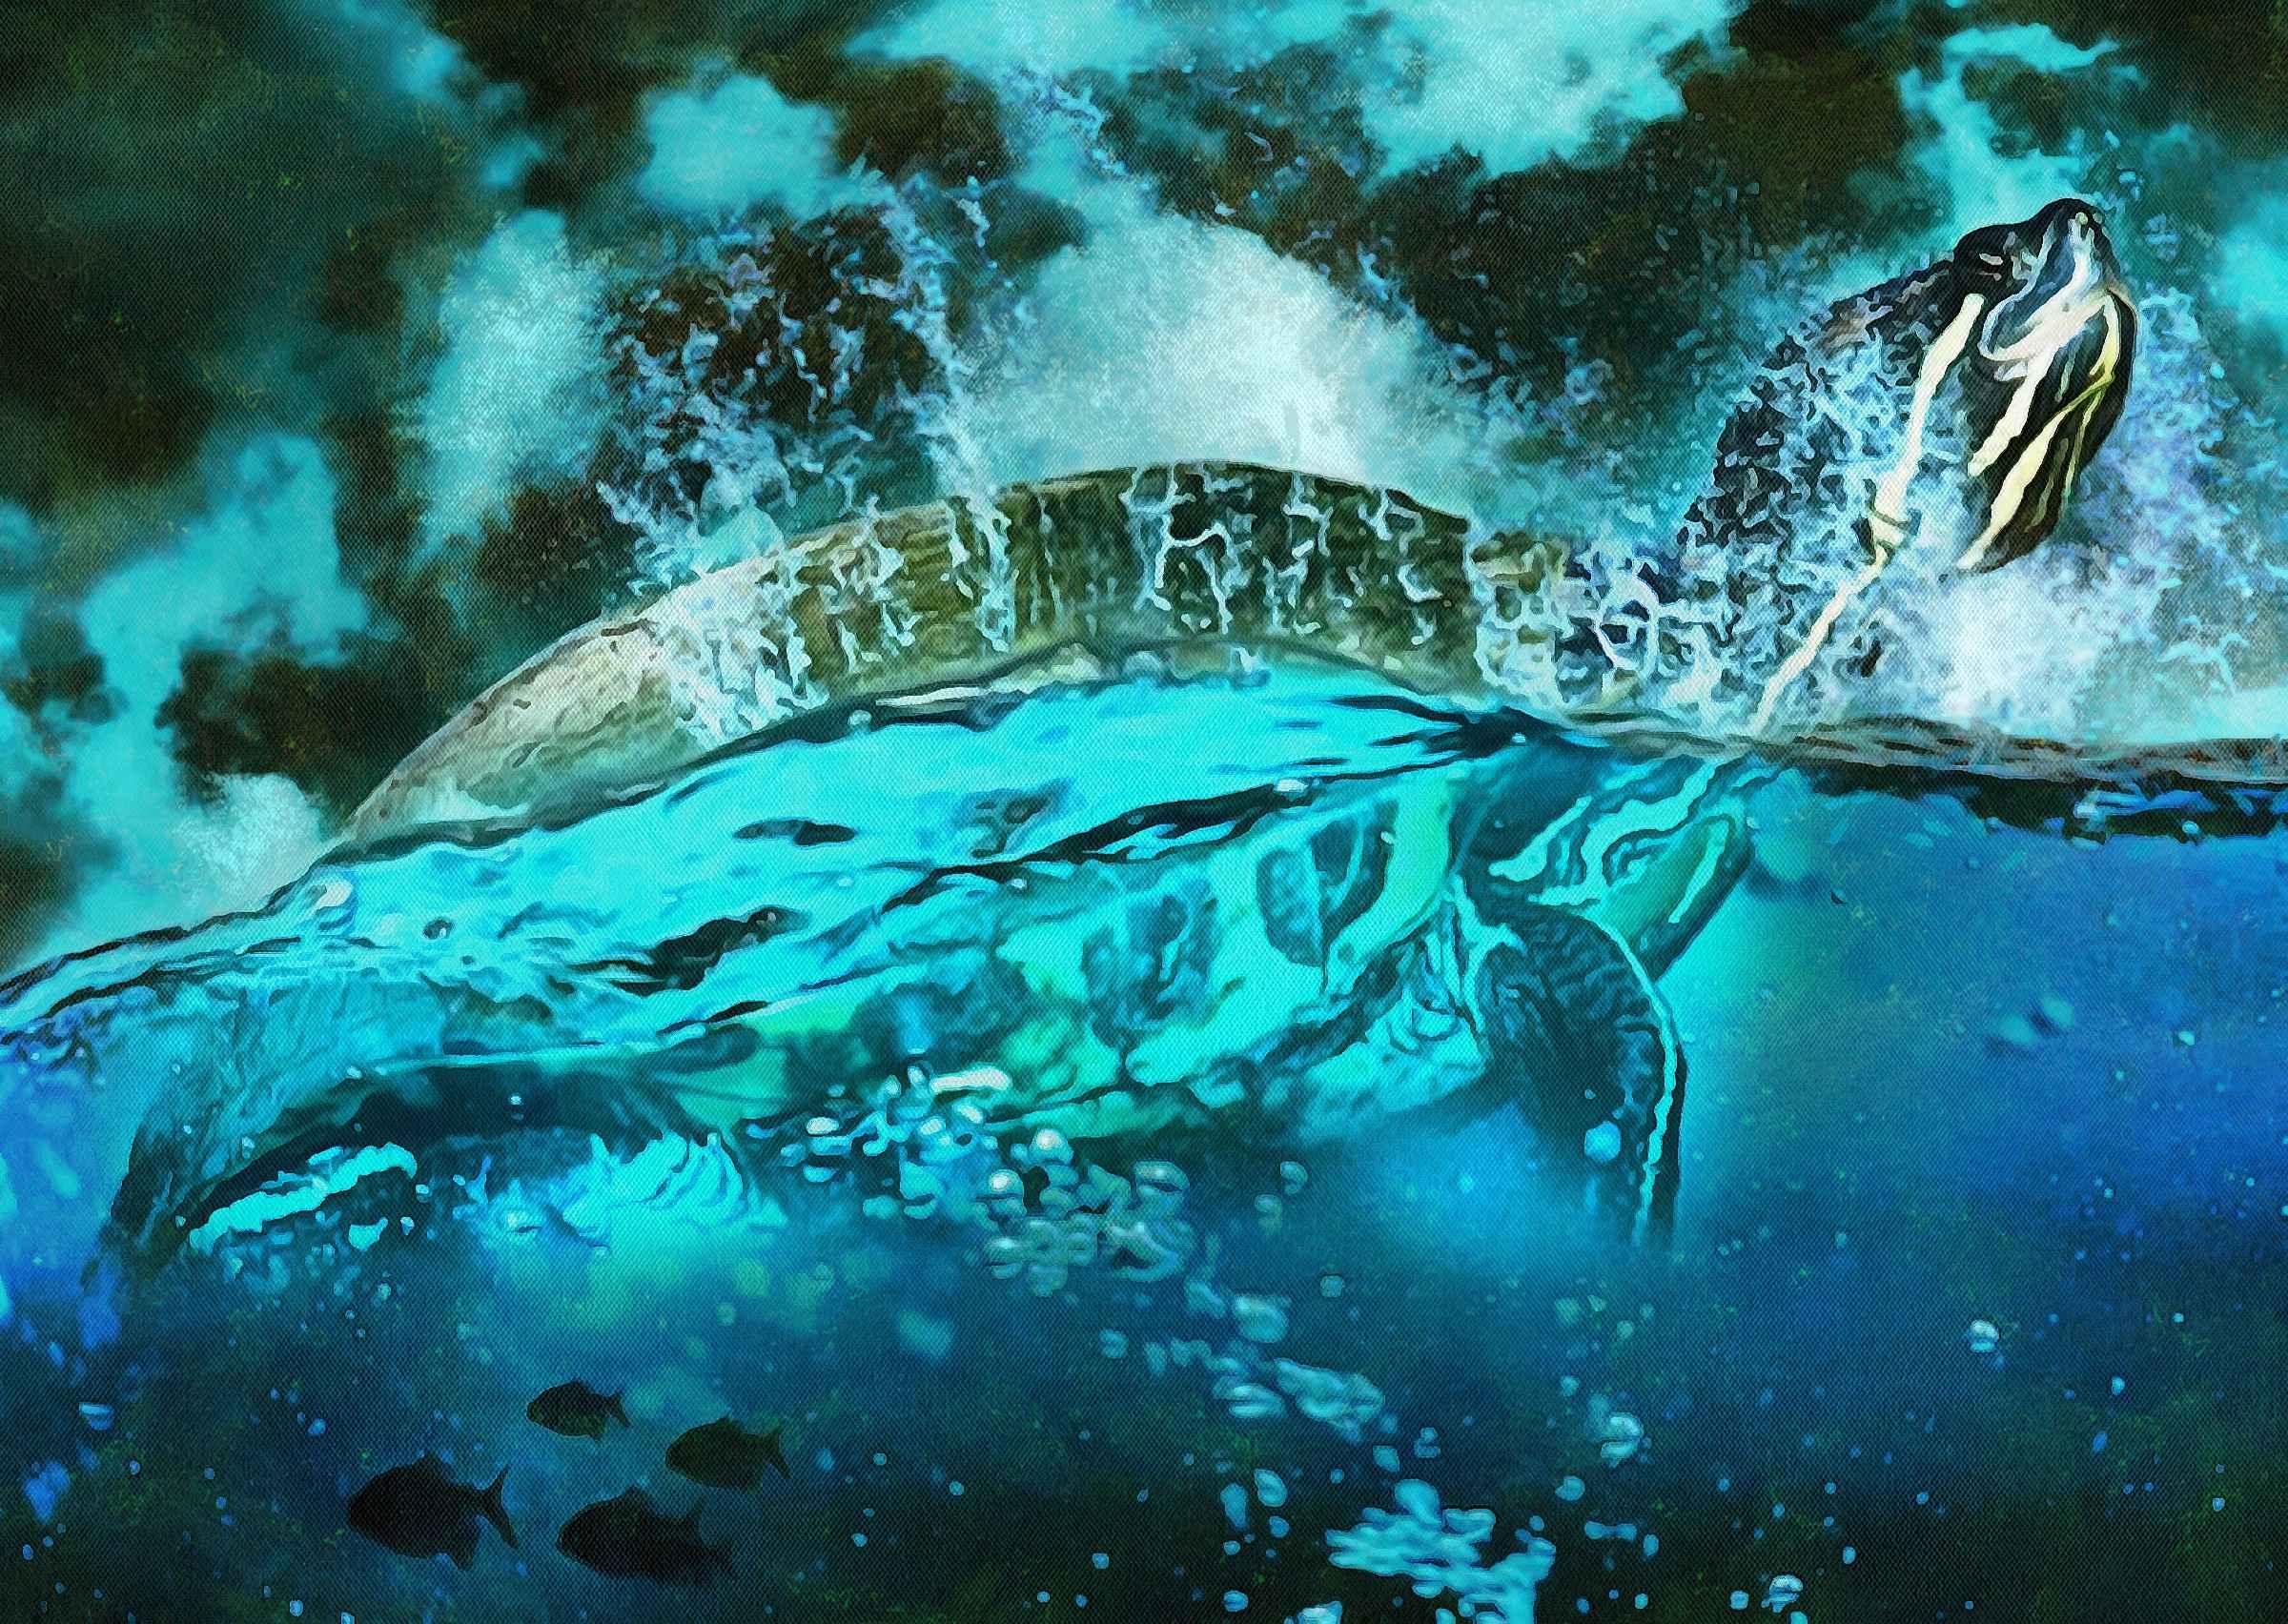 Tortoise, Turtle, loggerhead, terrapin, chelonian, leatherback, – Turtle free images, Tortoise free images, Turtle stock free images, Download free images turtles, turtle public domain images, tortoise public domain images!